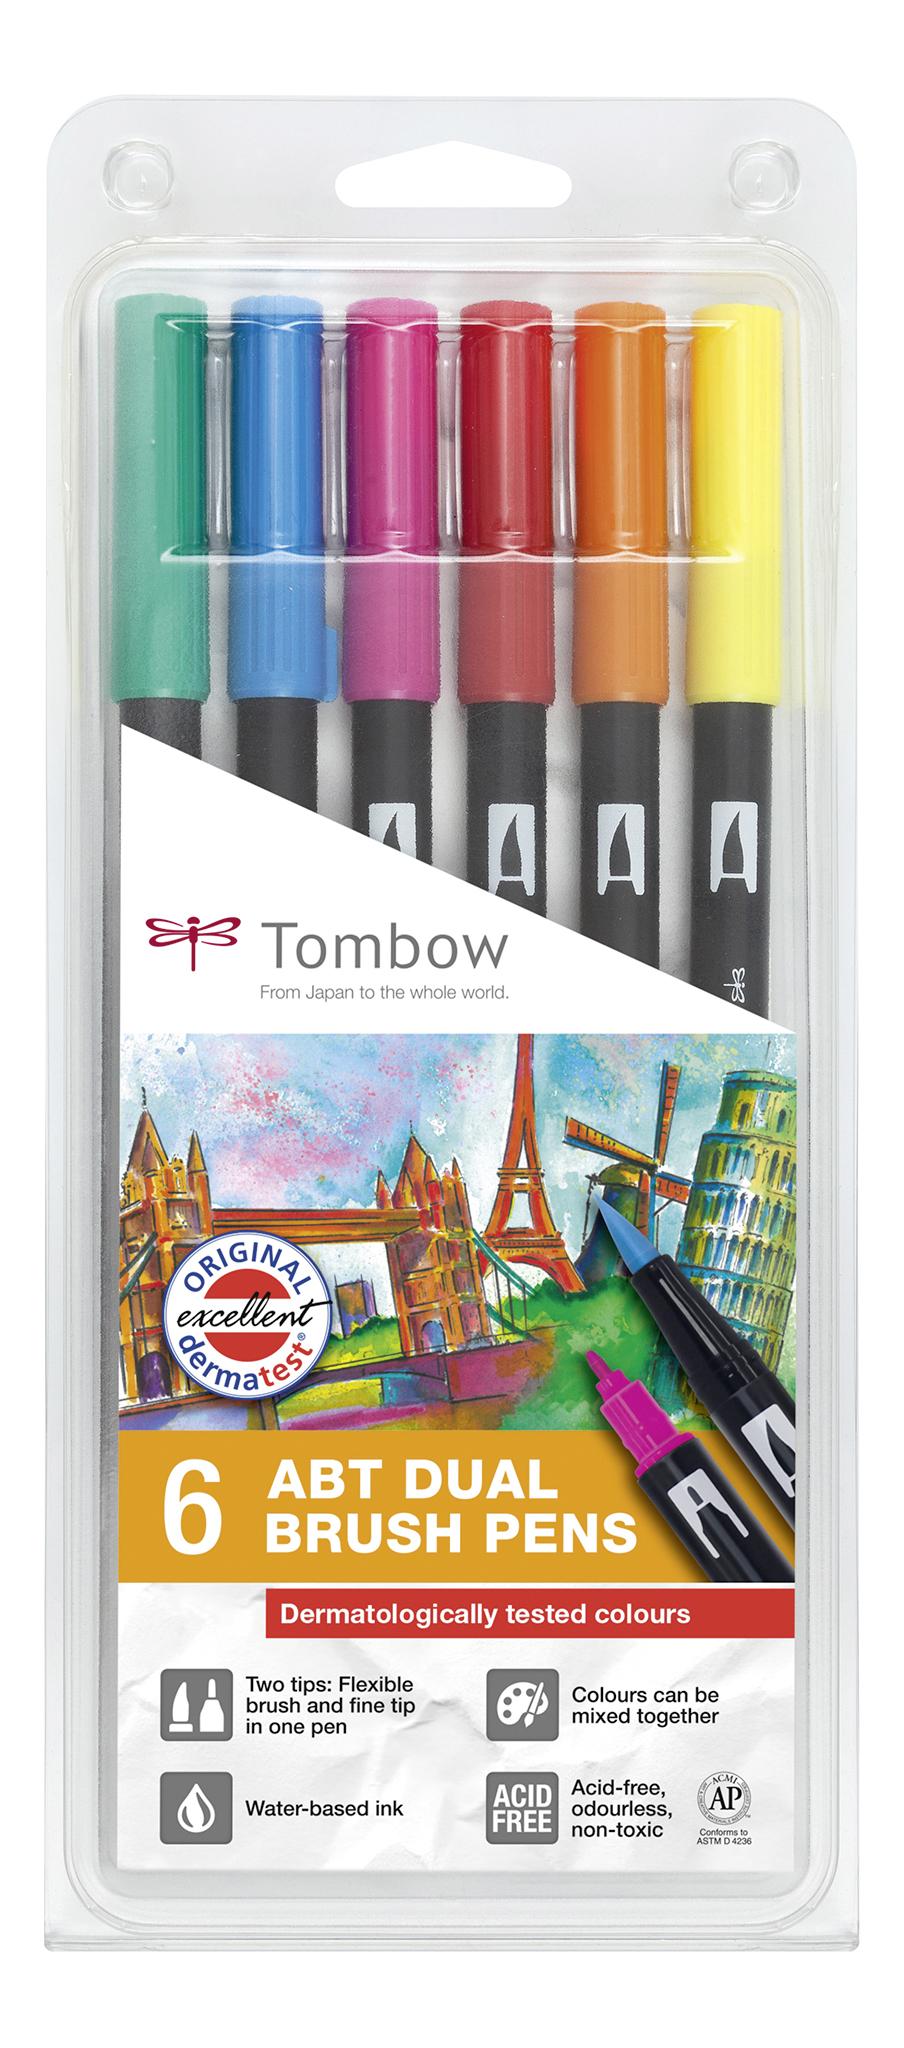 ABT Dual Brush Pen Drmatlgical PK6